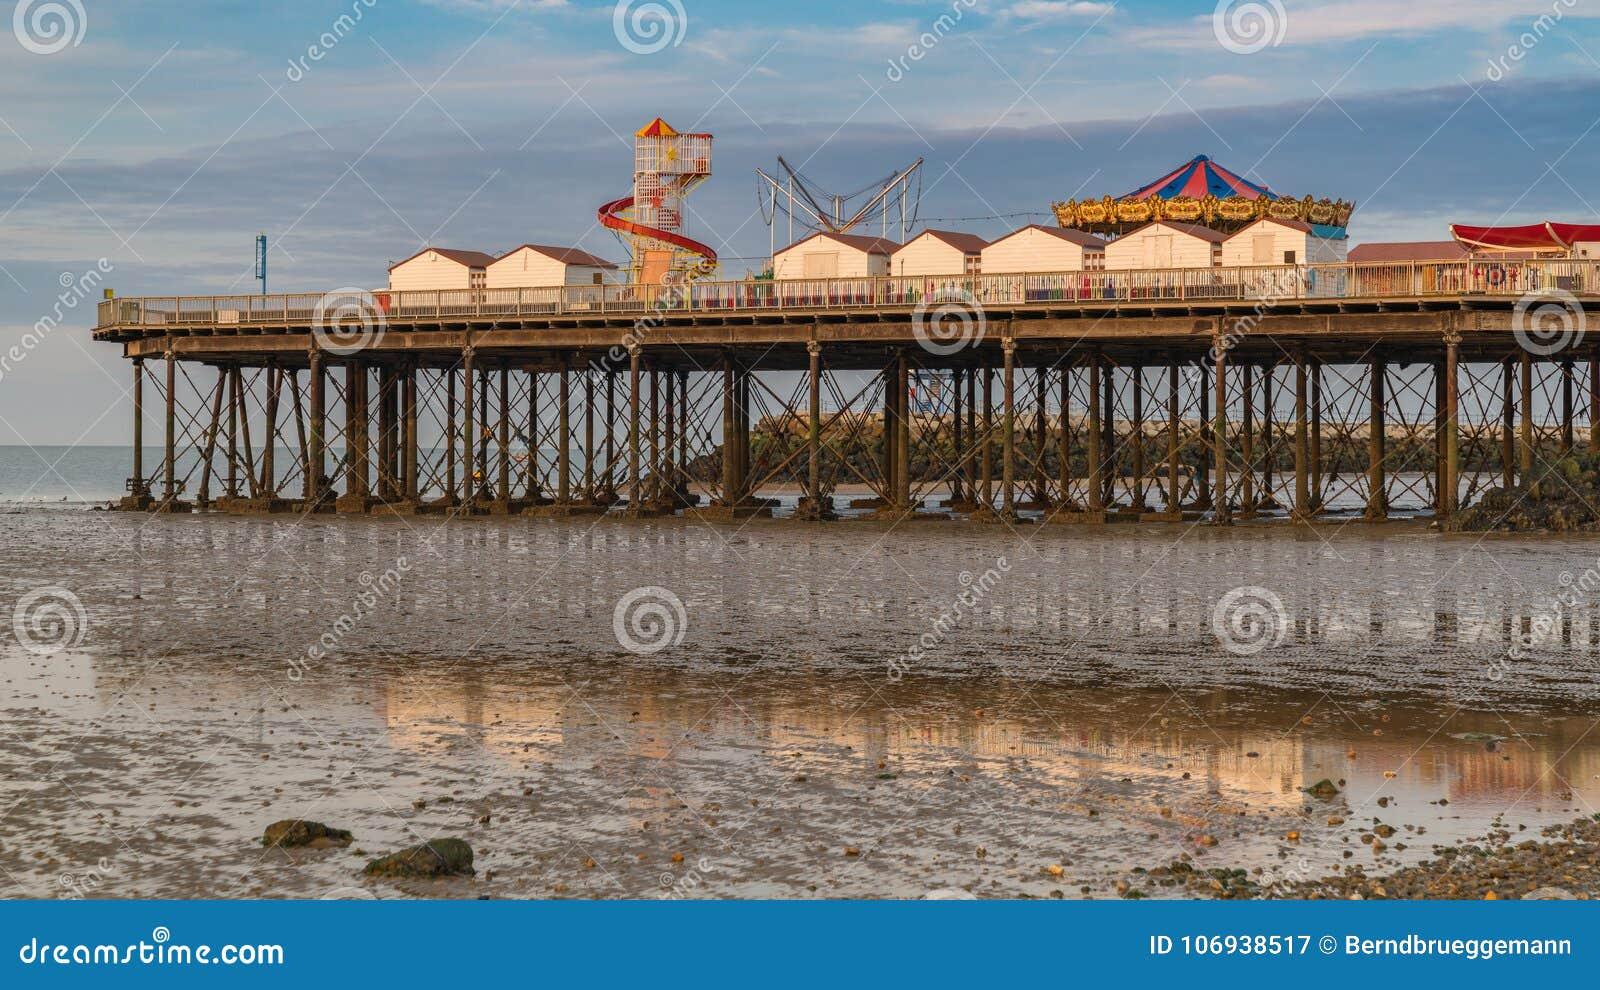 Bahía de Herne, Kent, Inglaterra, Reino Unido